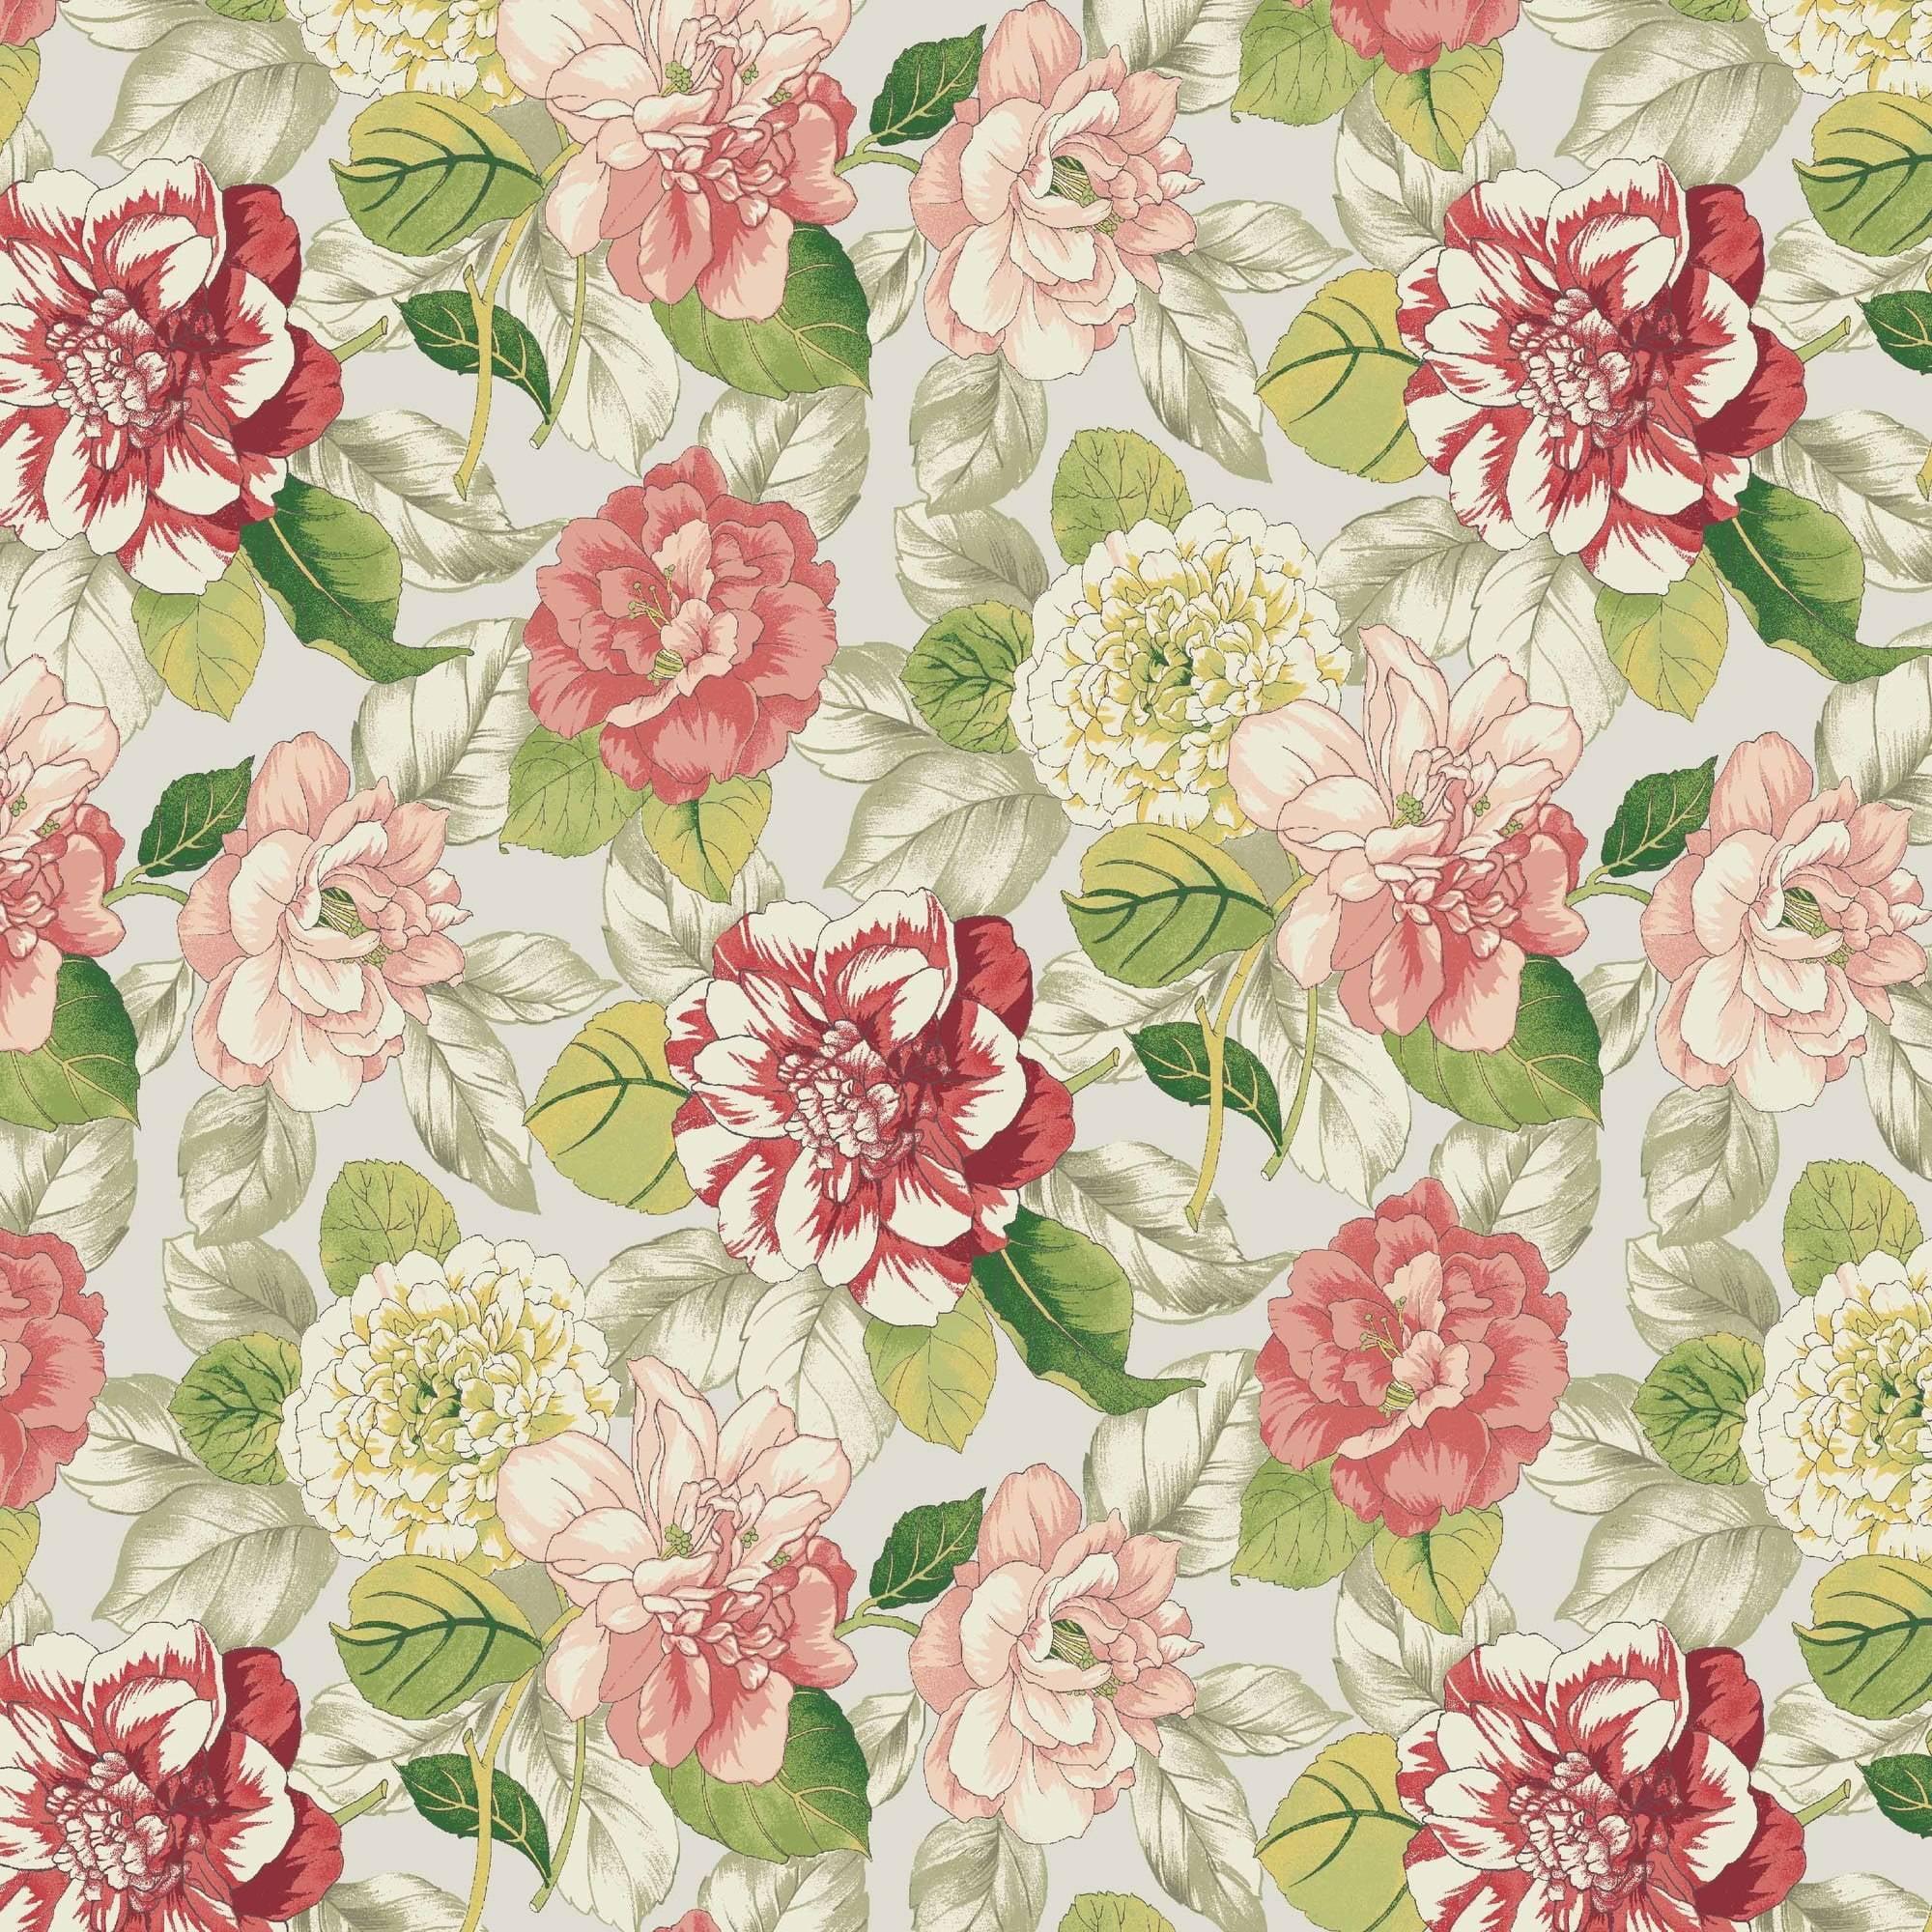 100 Home Decor Print Fabric Waverly Waverly Summer